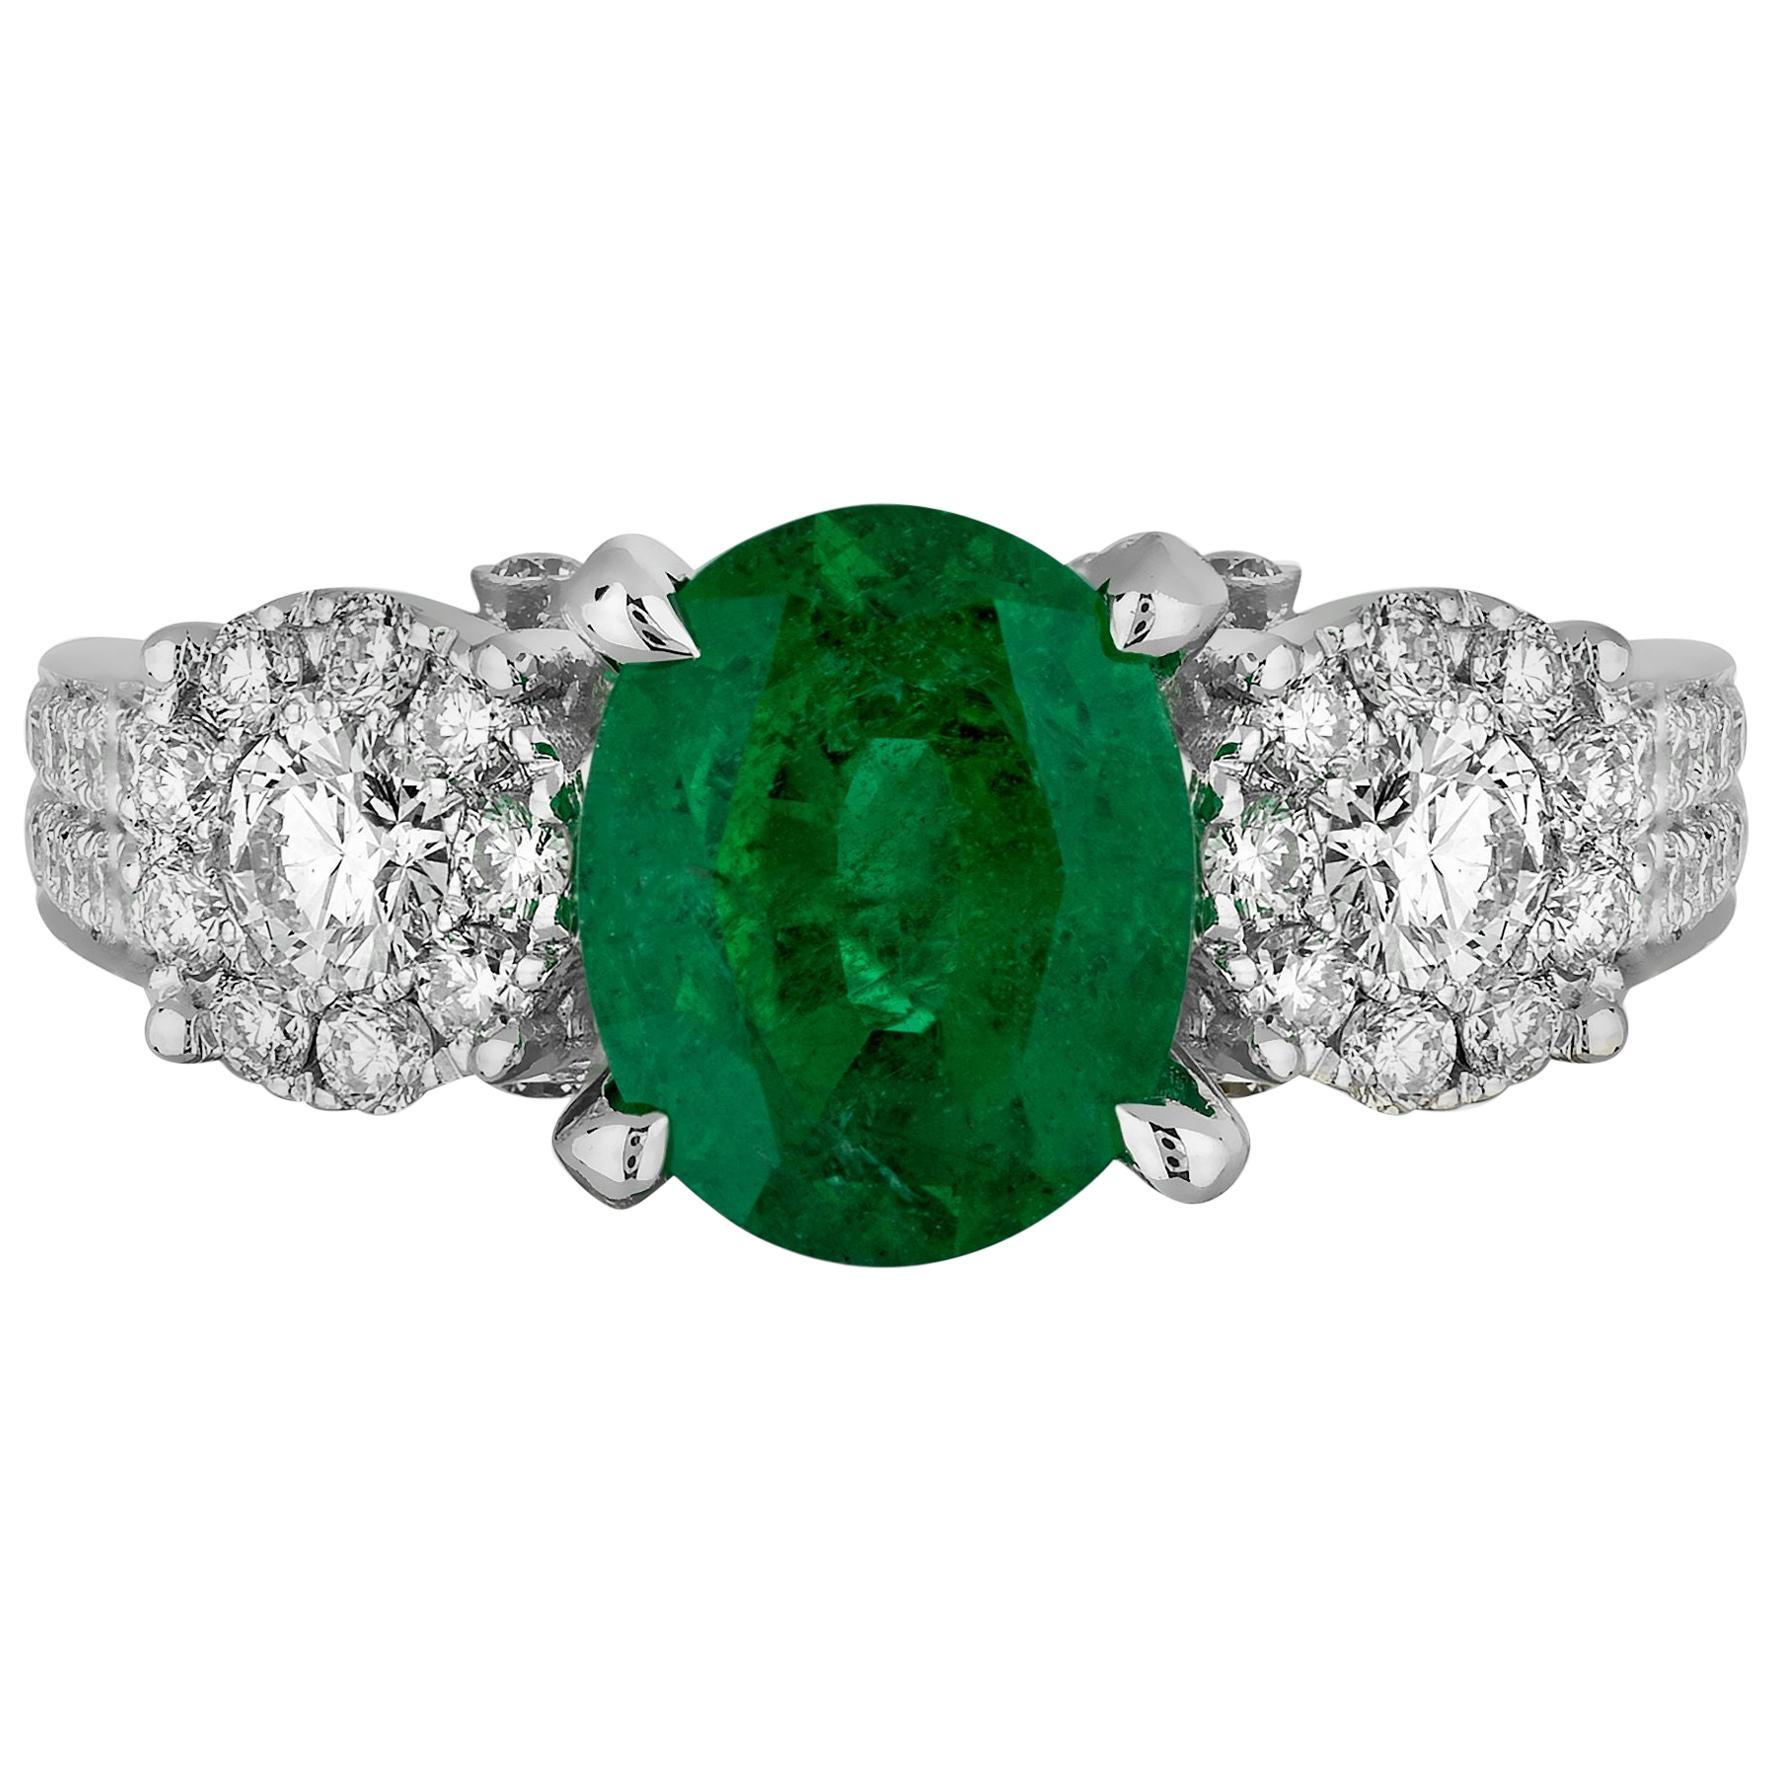 1.85 Carat Zambian Emerald Diamond Cocktail Ring